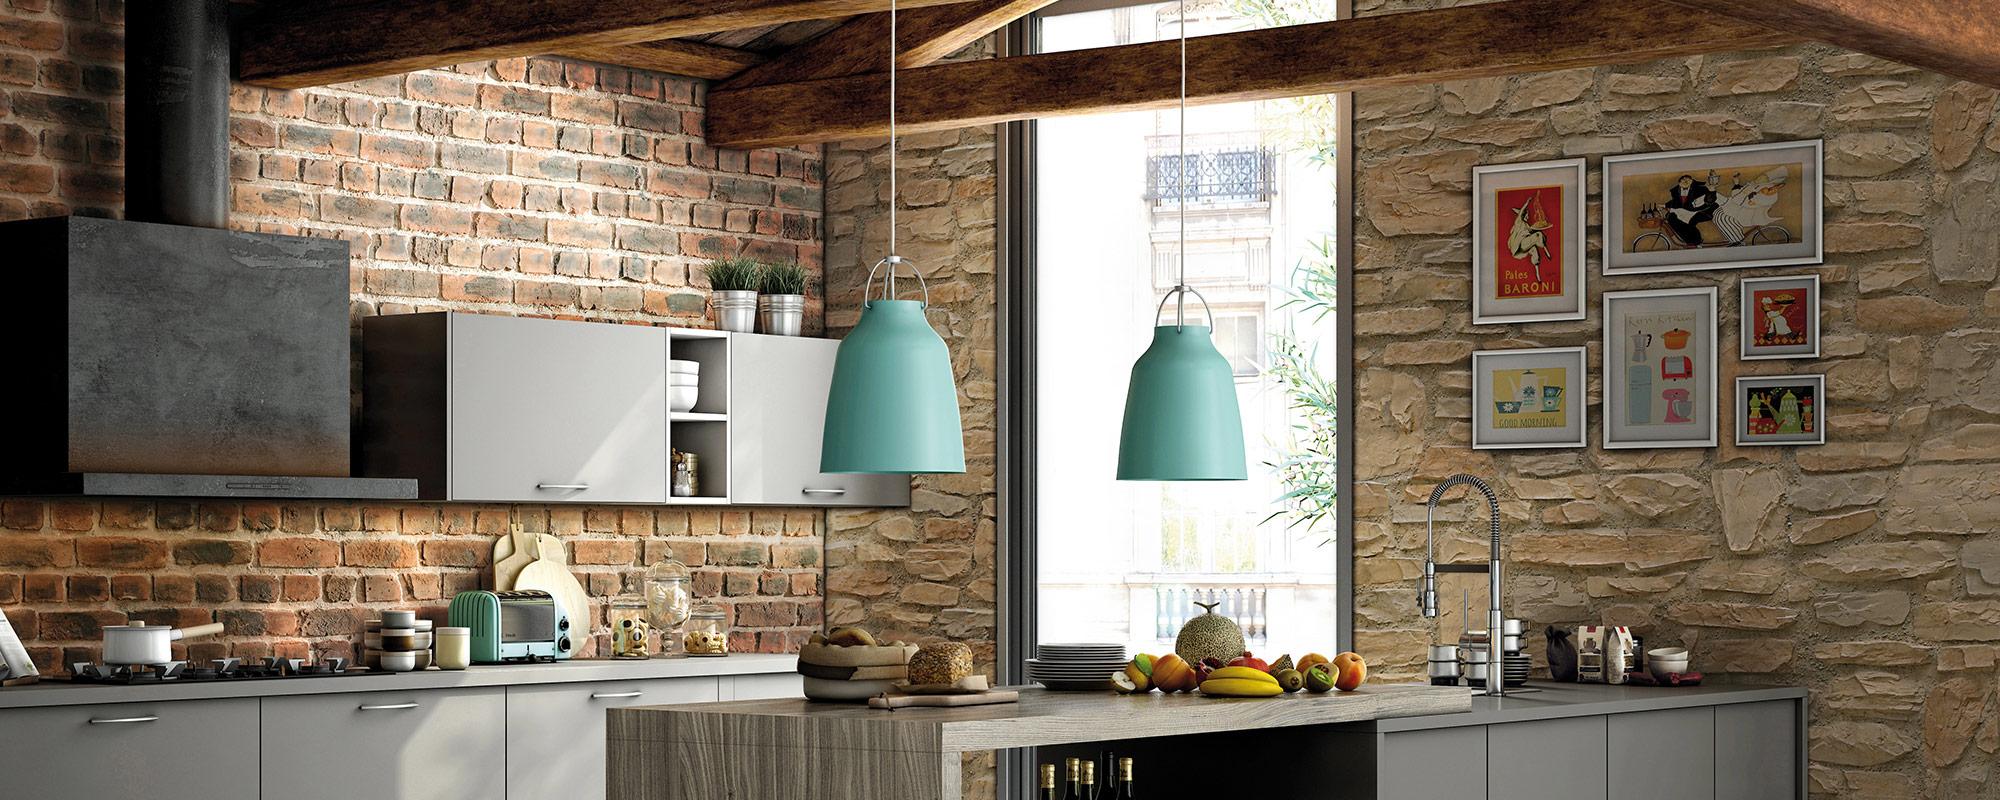 Paneles decorativos cocina alta calidad pvc decorativo - Panel decorativo cocina ...